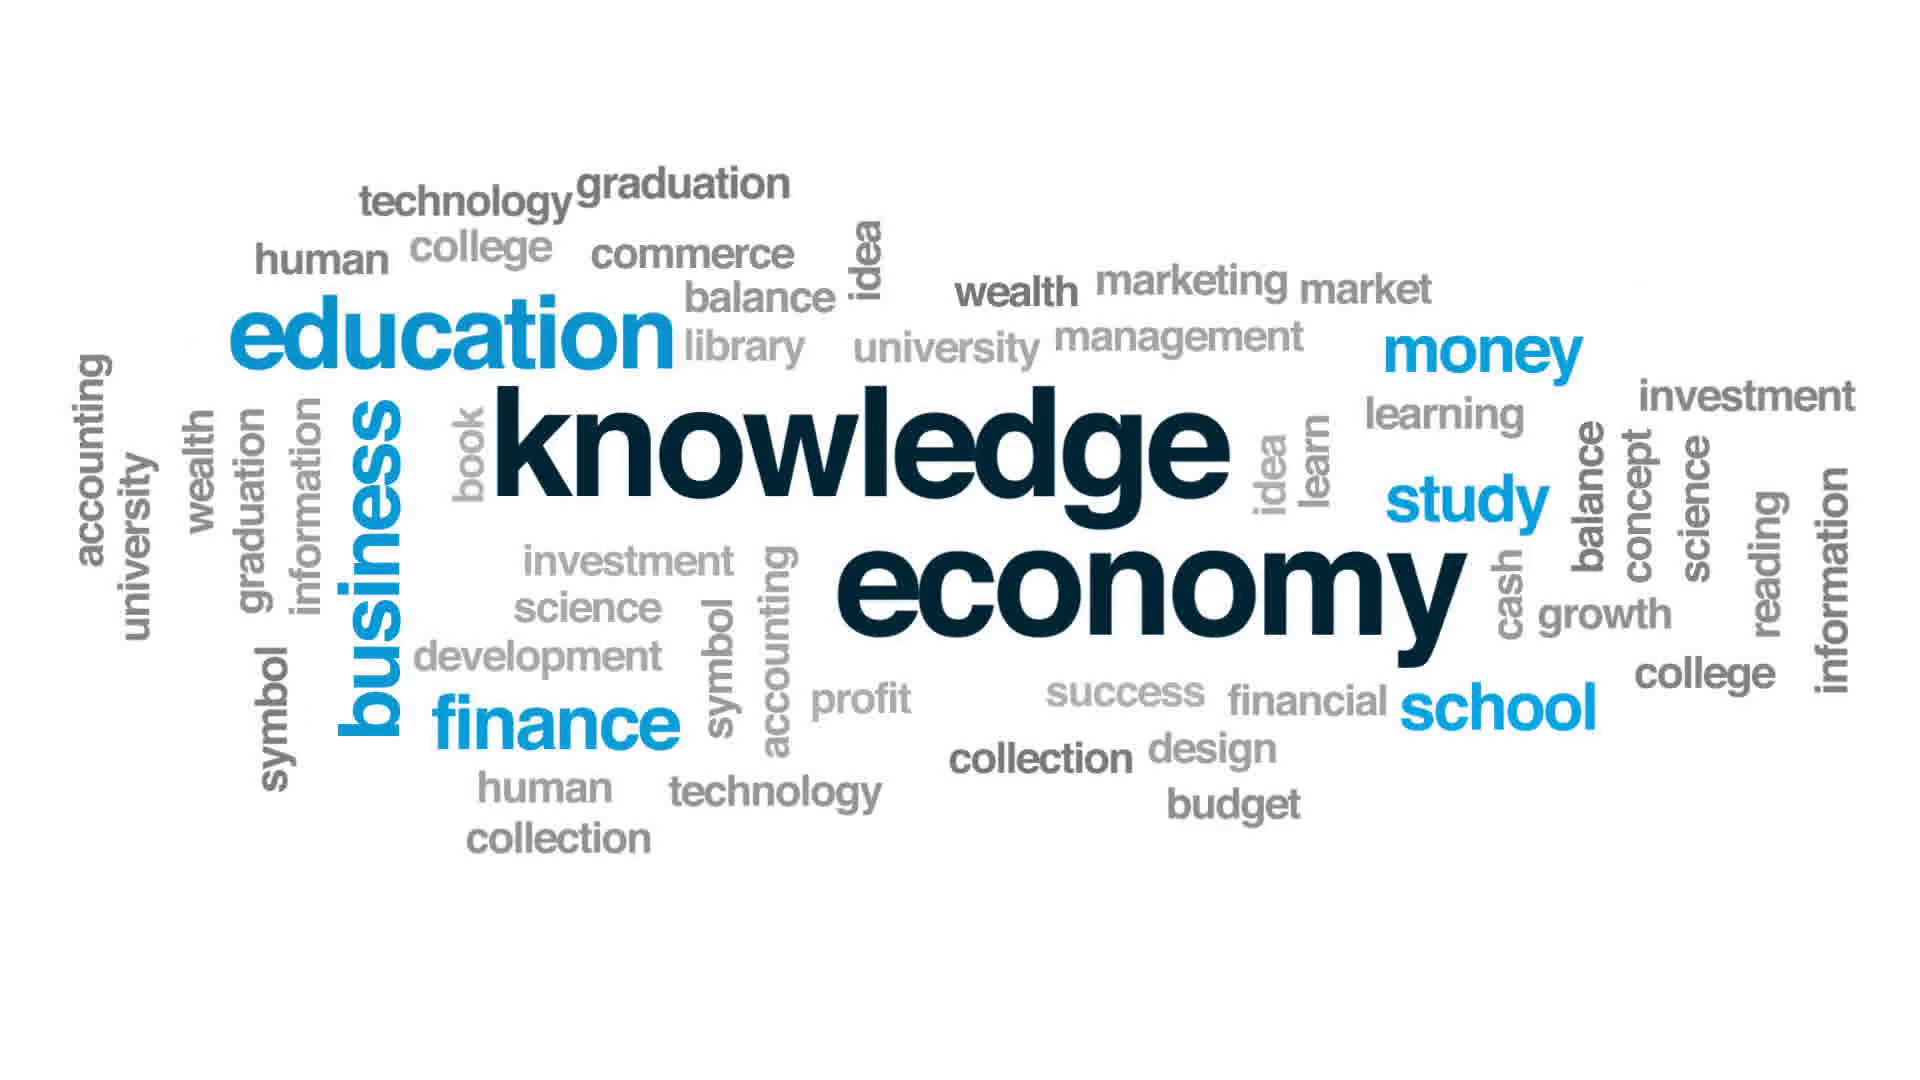 knowledge economy word cloud